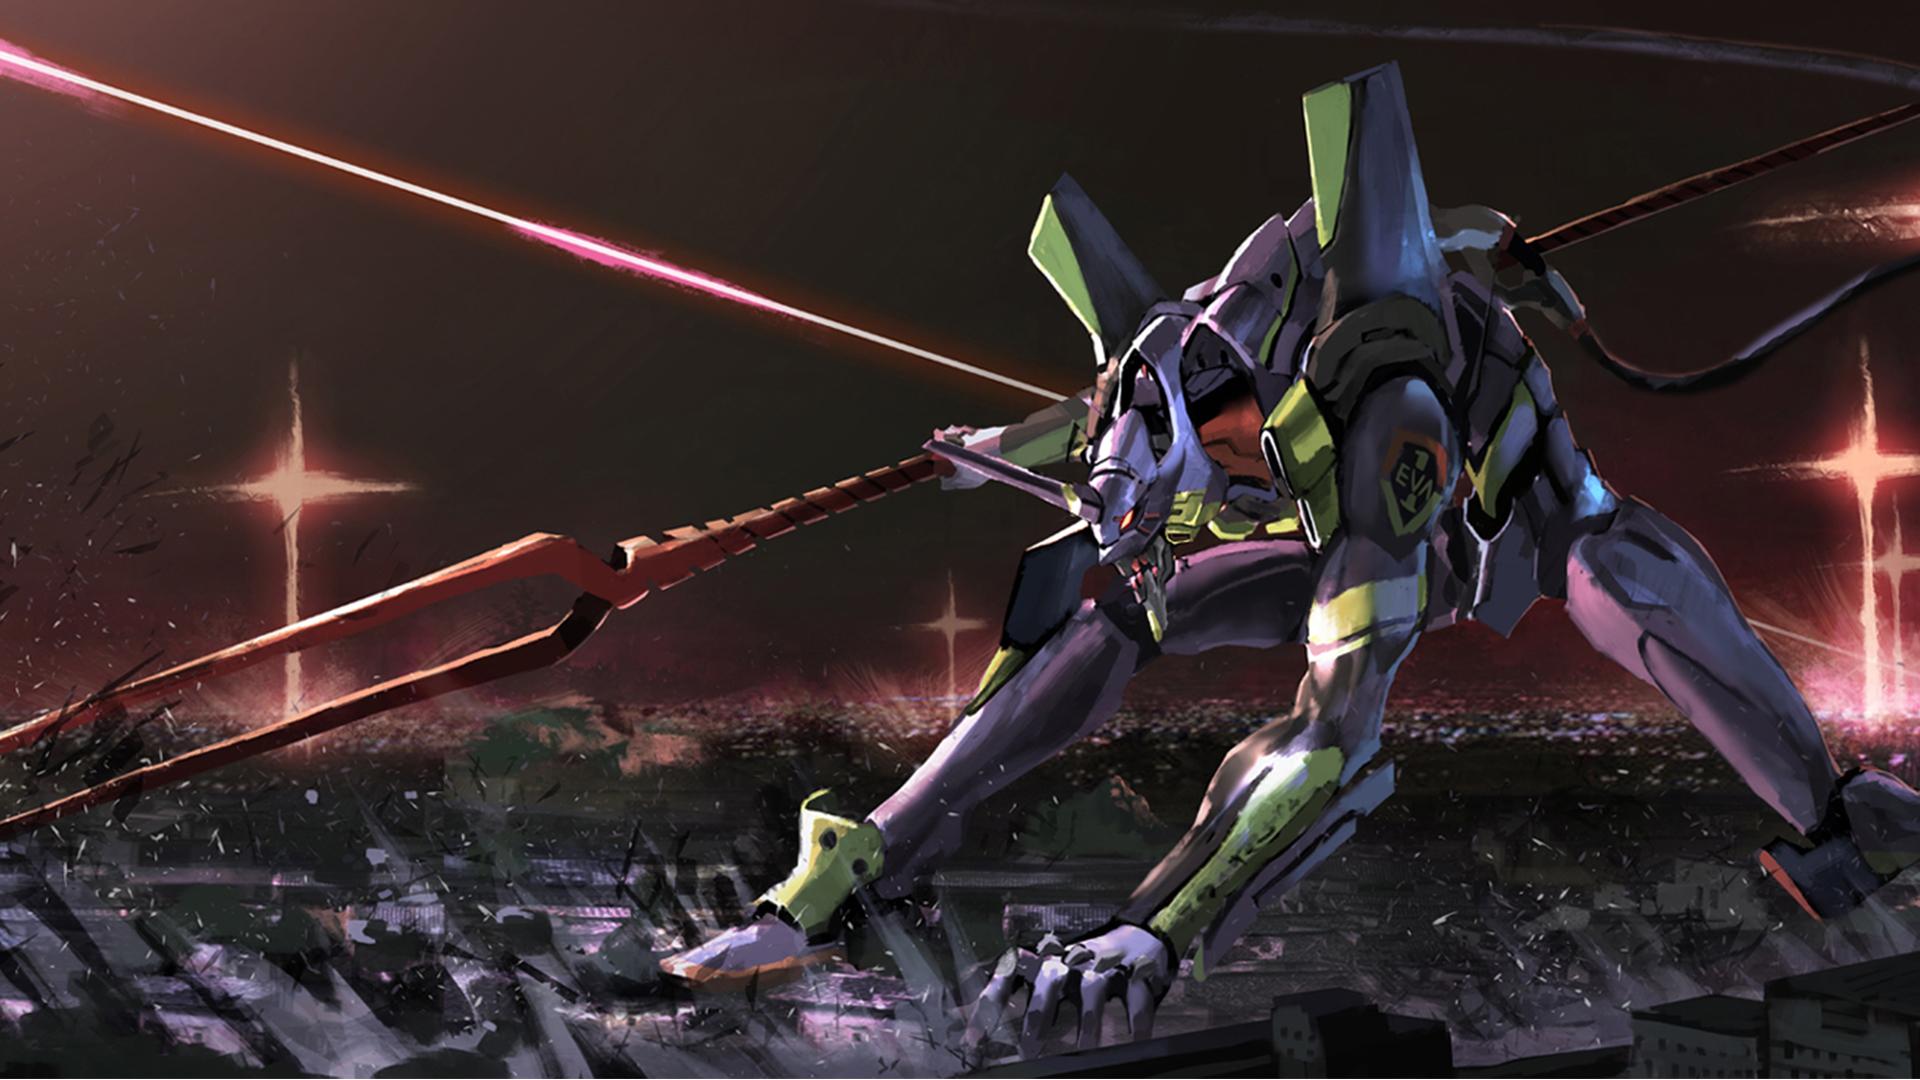 Anime Evangelion Unit 01 Neon Genesis Evangelion 1920x1080